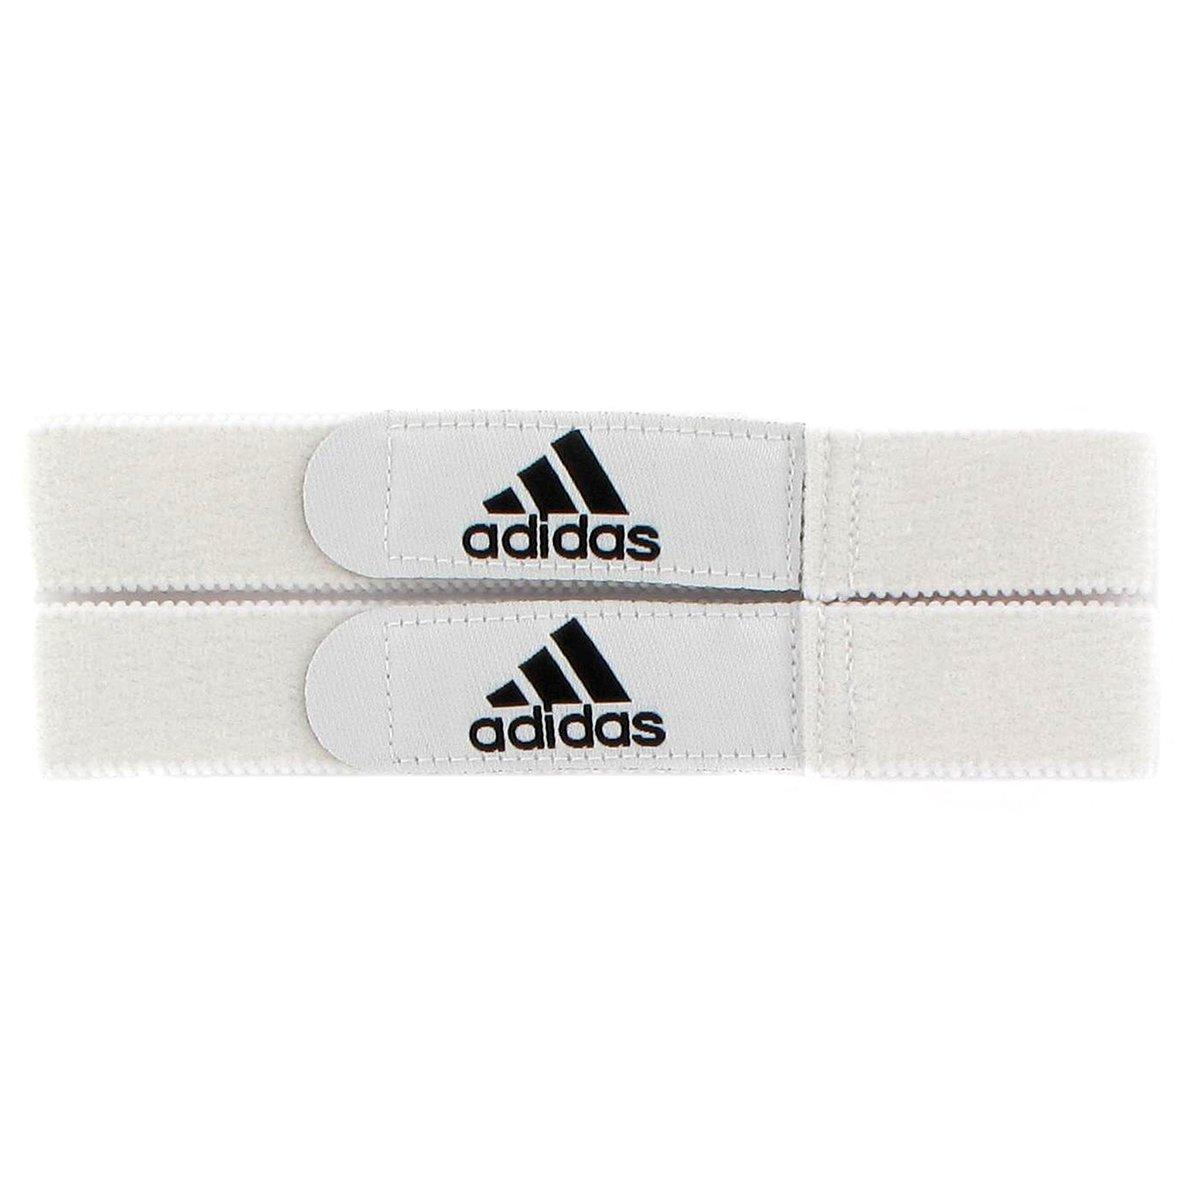 Adidas シンガード用ストラップ B007SYG3JIホワイト NA